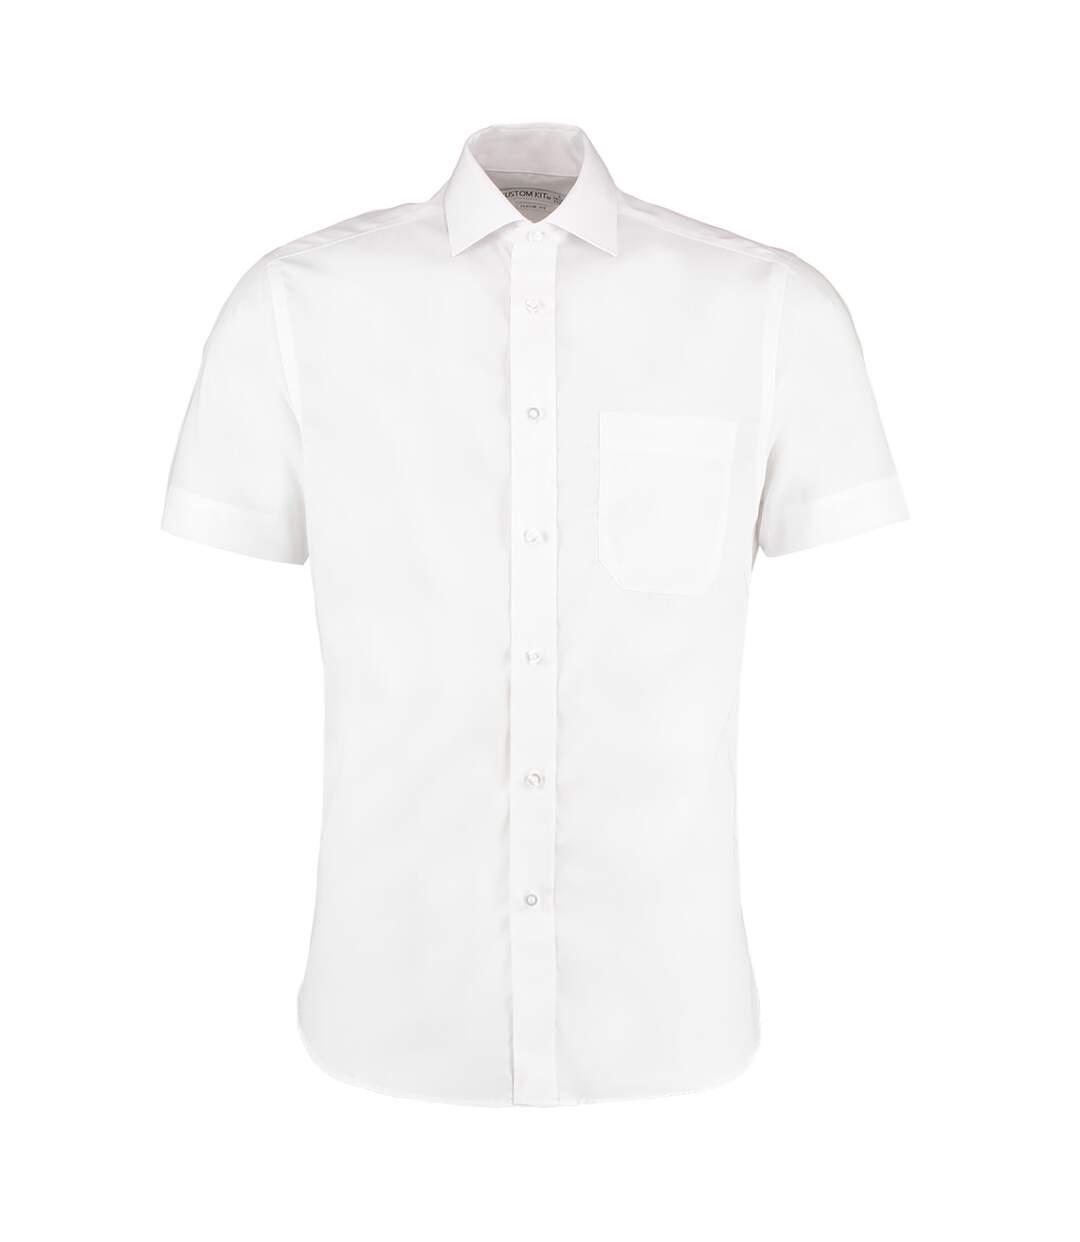 Kustom Kit Mens Premium Non Iron Short Sleeve Shirt (White) - UTBC596